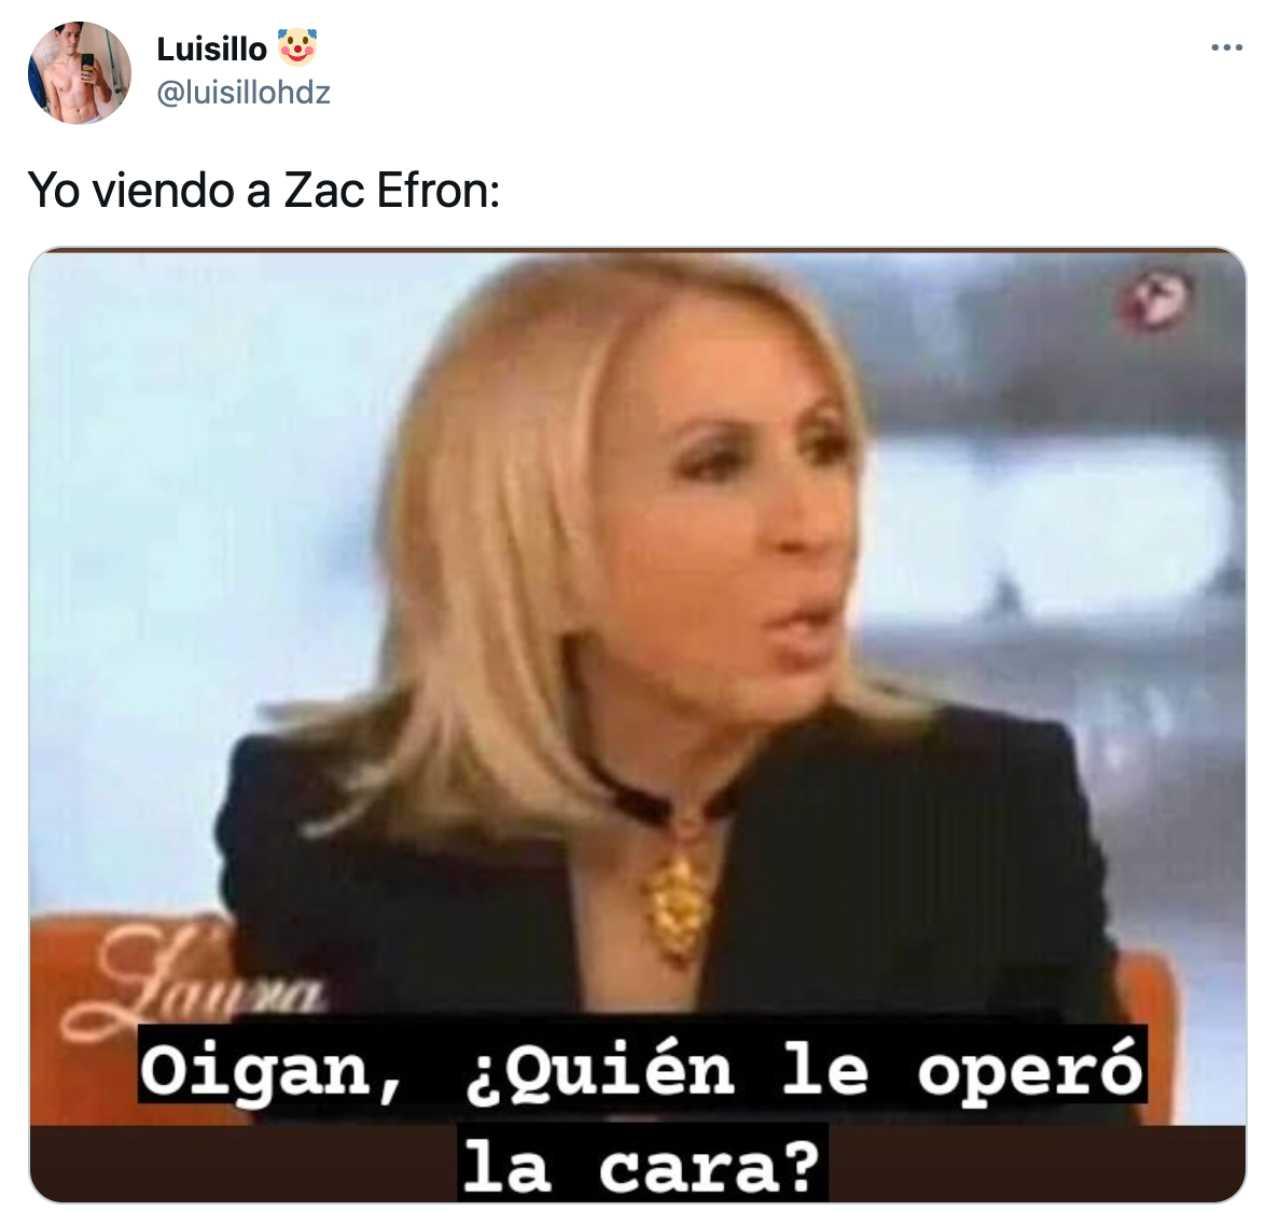 Meme de Zac Efron con Laura Bozzo